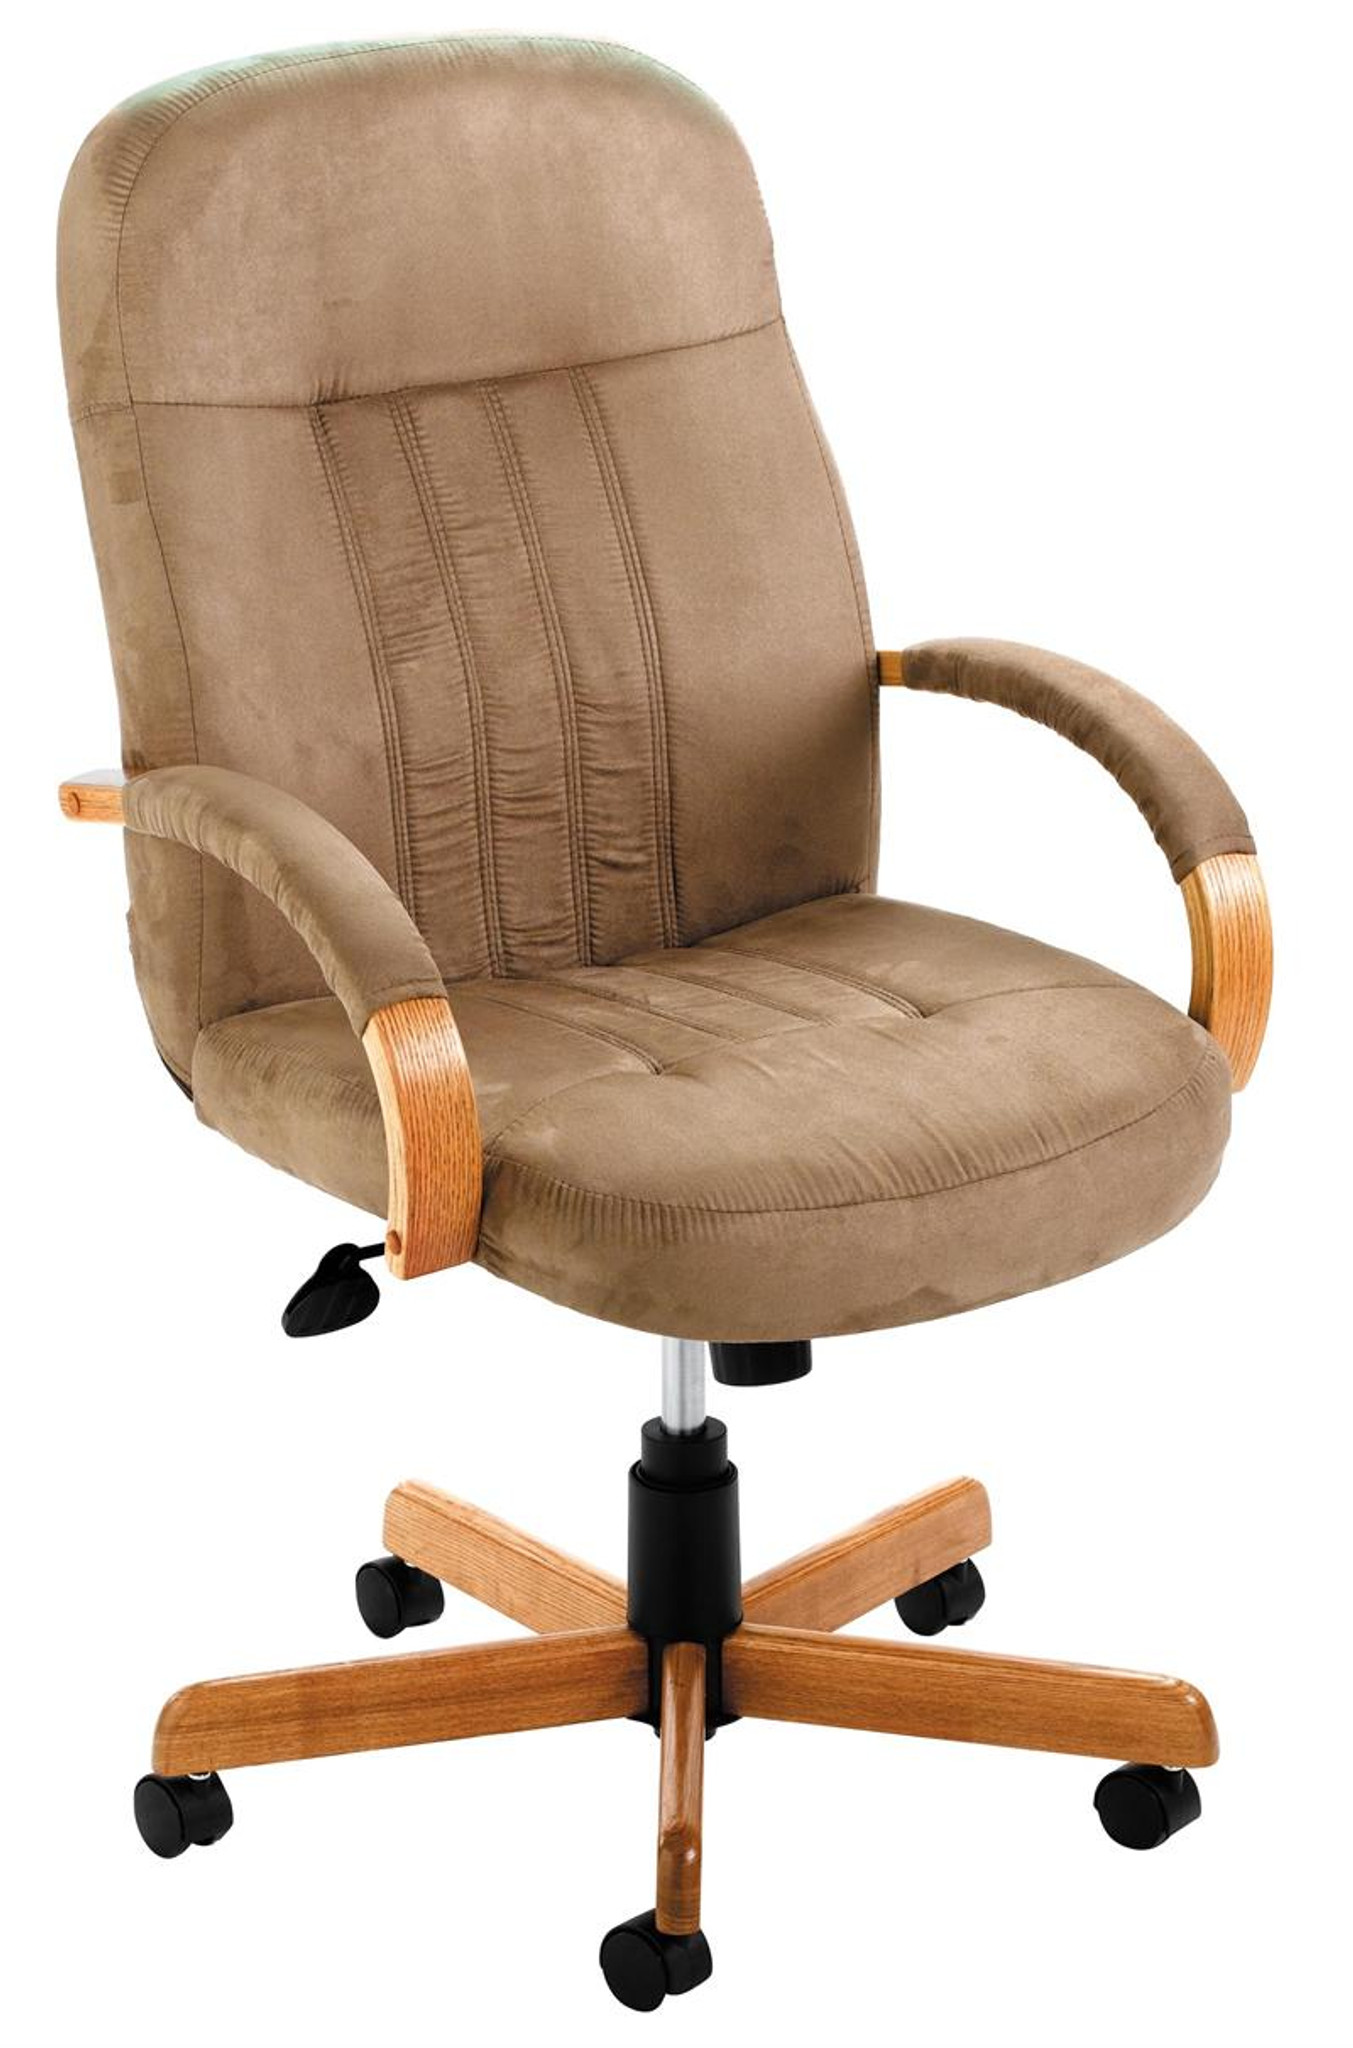 Wonderful NEW Office Furniture DESK CHAIR, STONE MICRO, OAK BASE